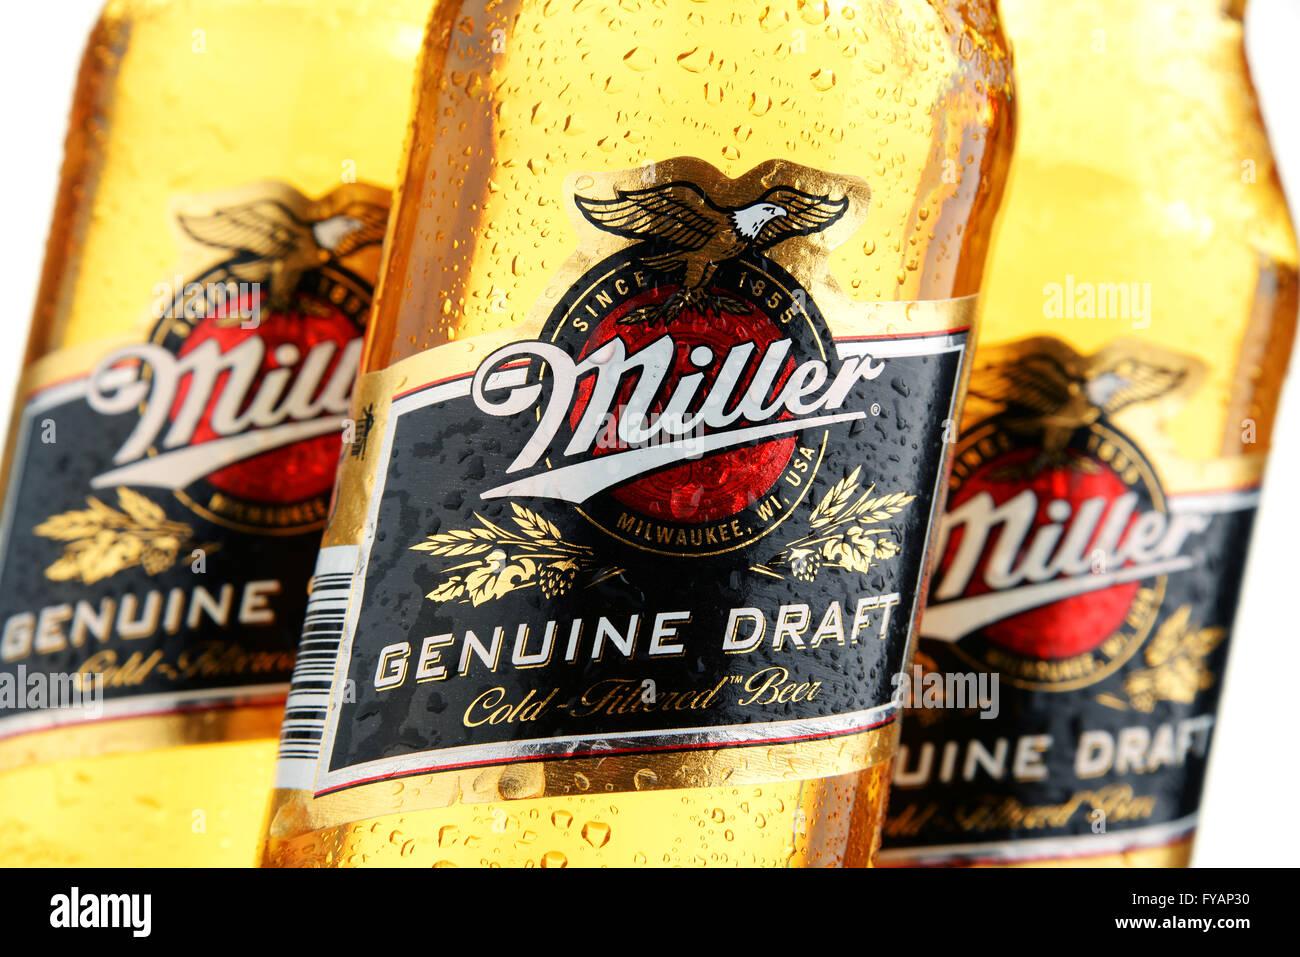 Bottles of Miller Genuine Draft beer - Stock Image